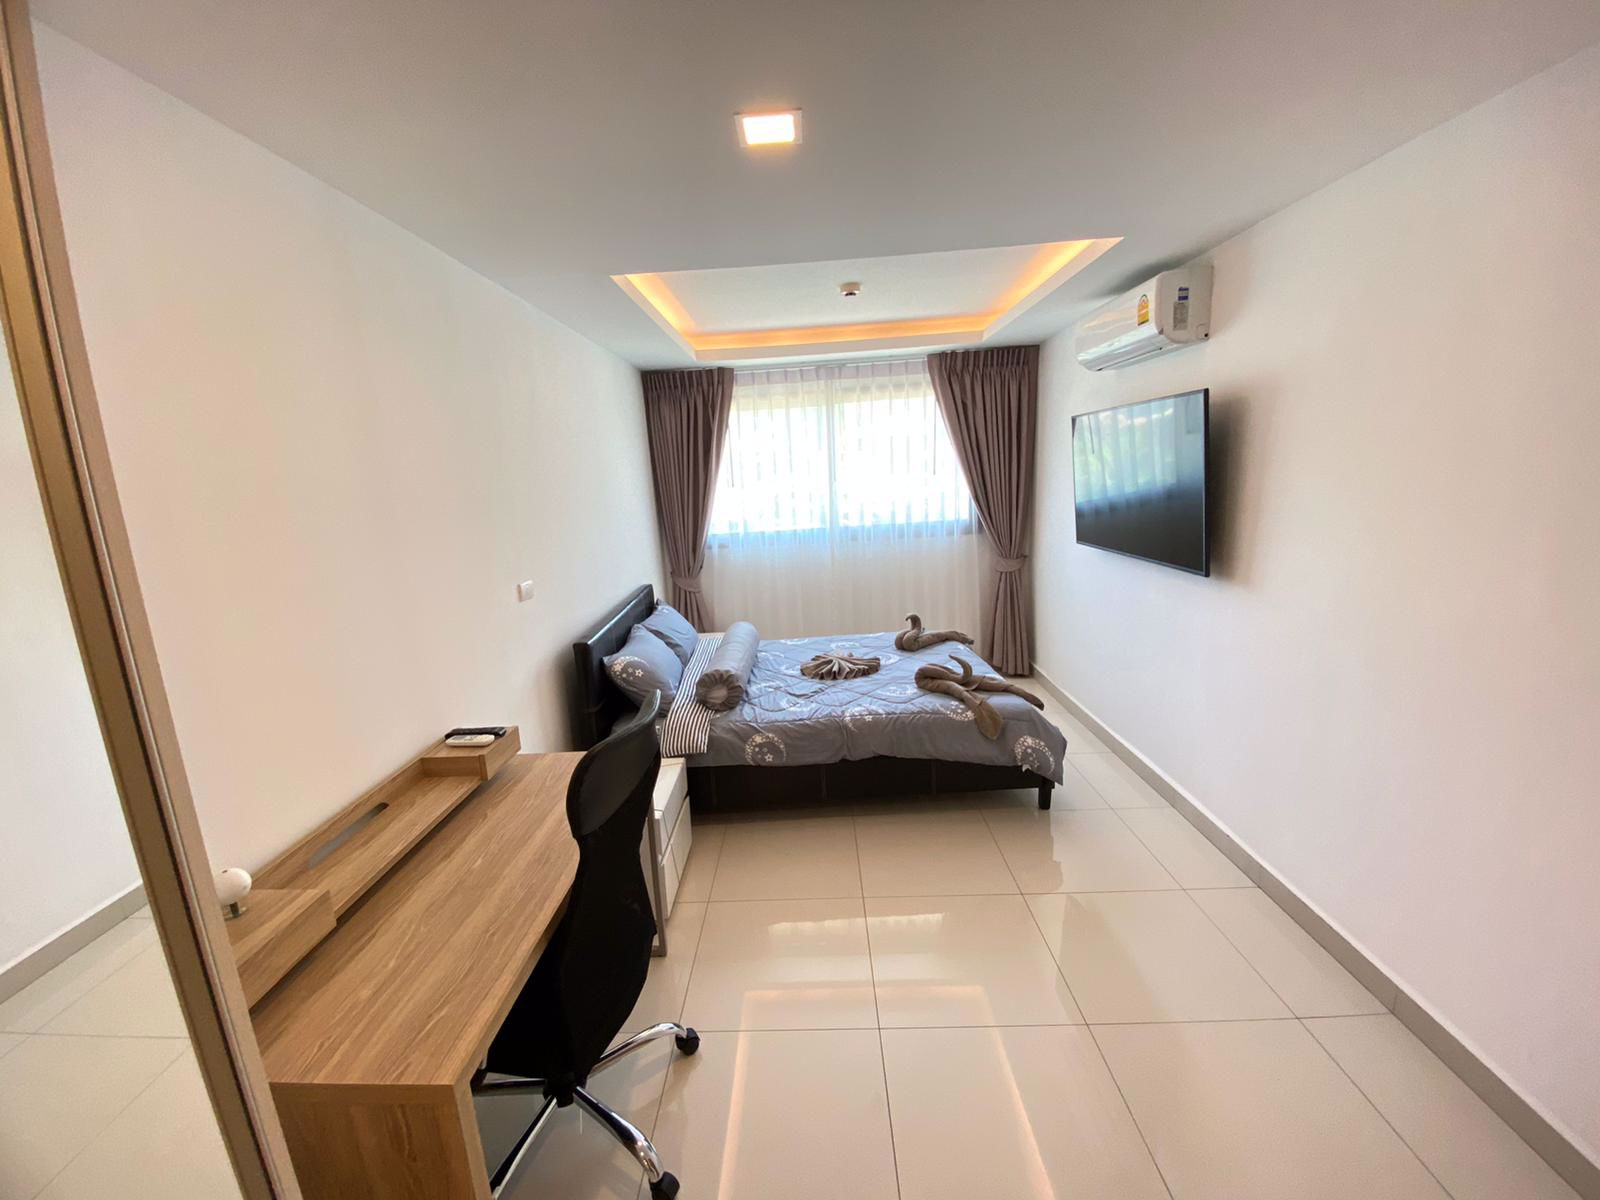 Picture of 2 bedroom Condo